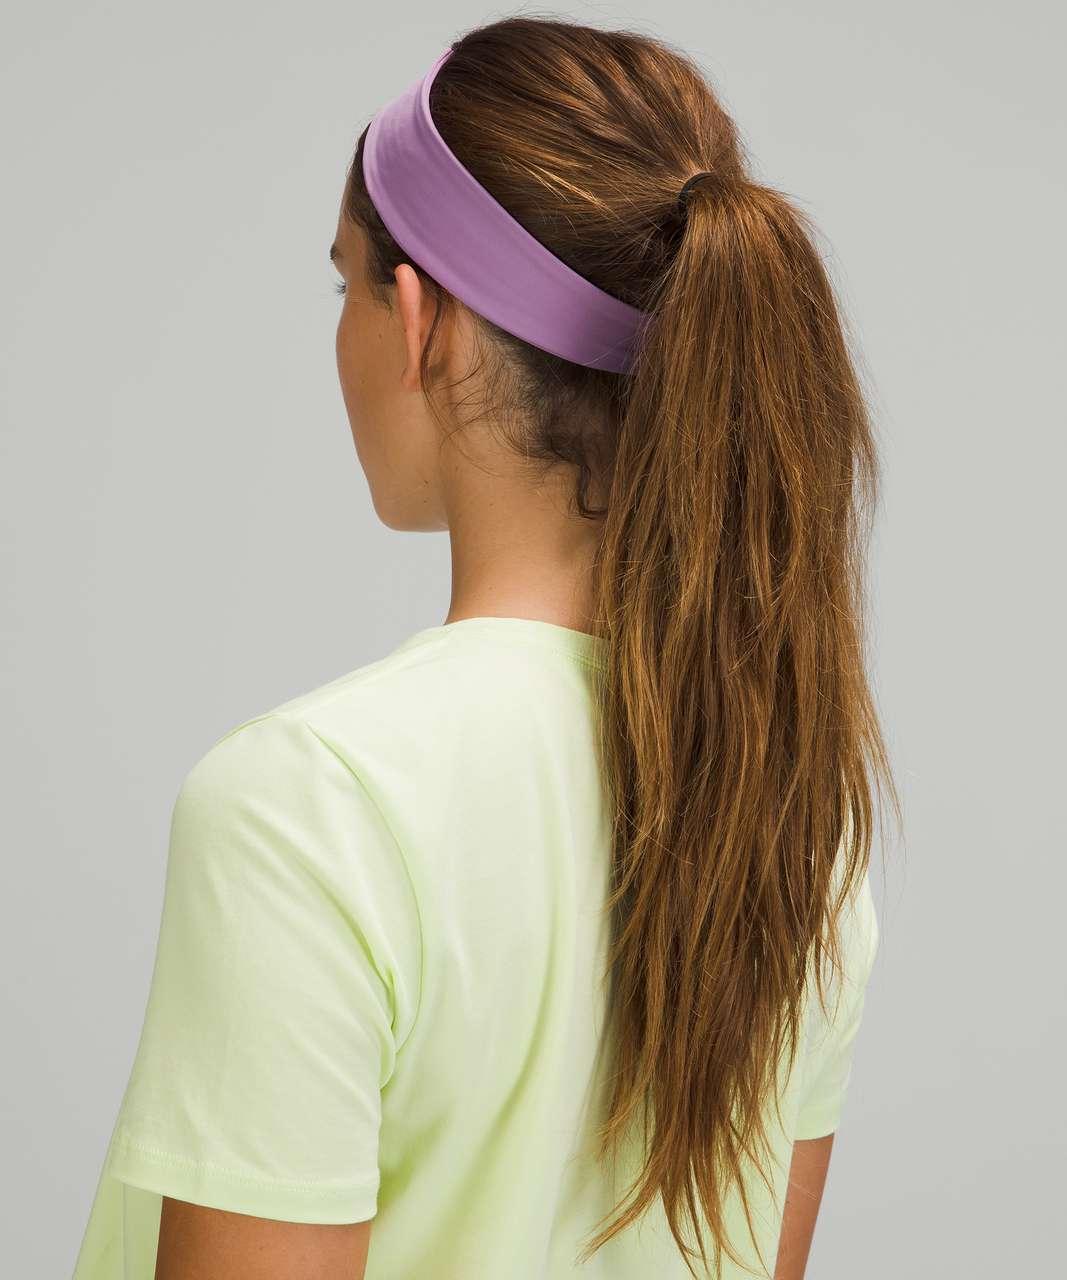 Lululemon Fly Away Tamer Headband *Luxtreme - Wisteria Purple